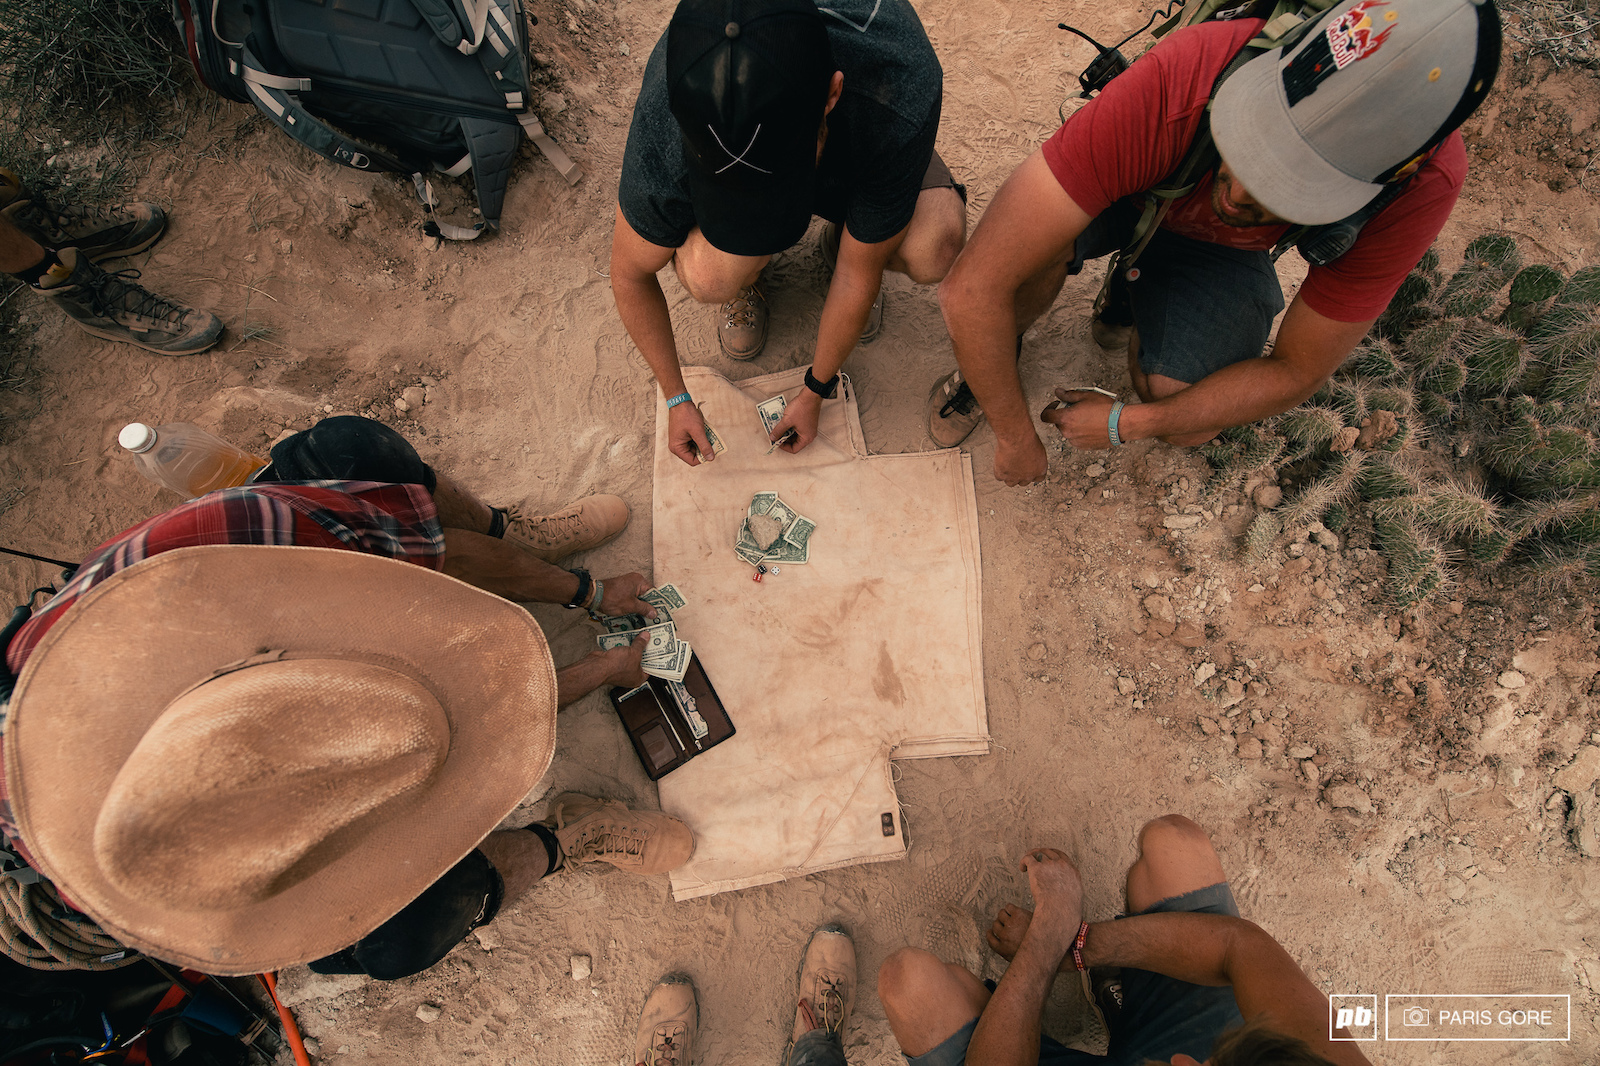 Mid day hood rat games in the desert.